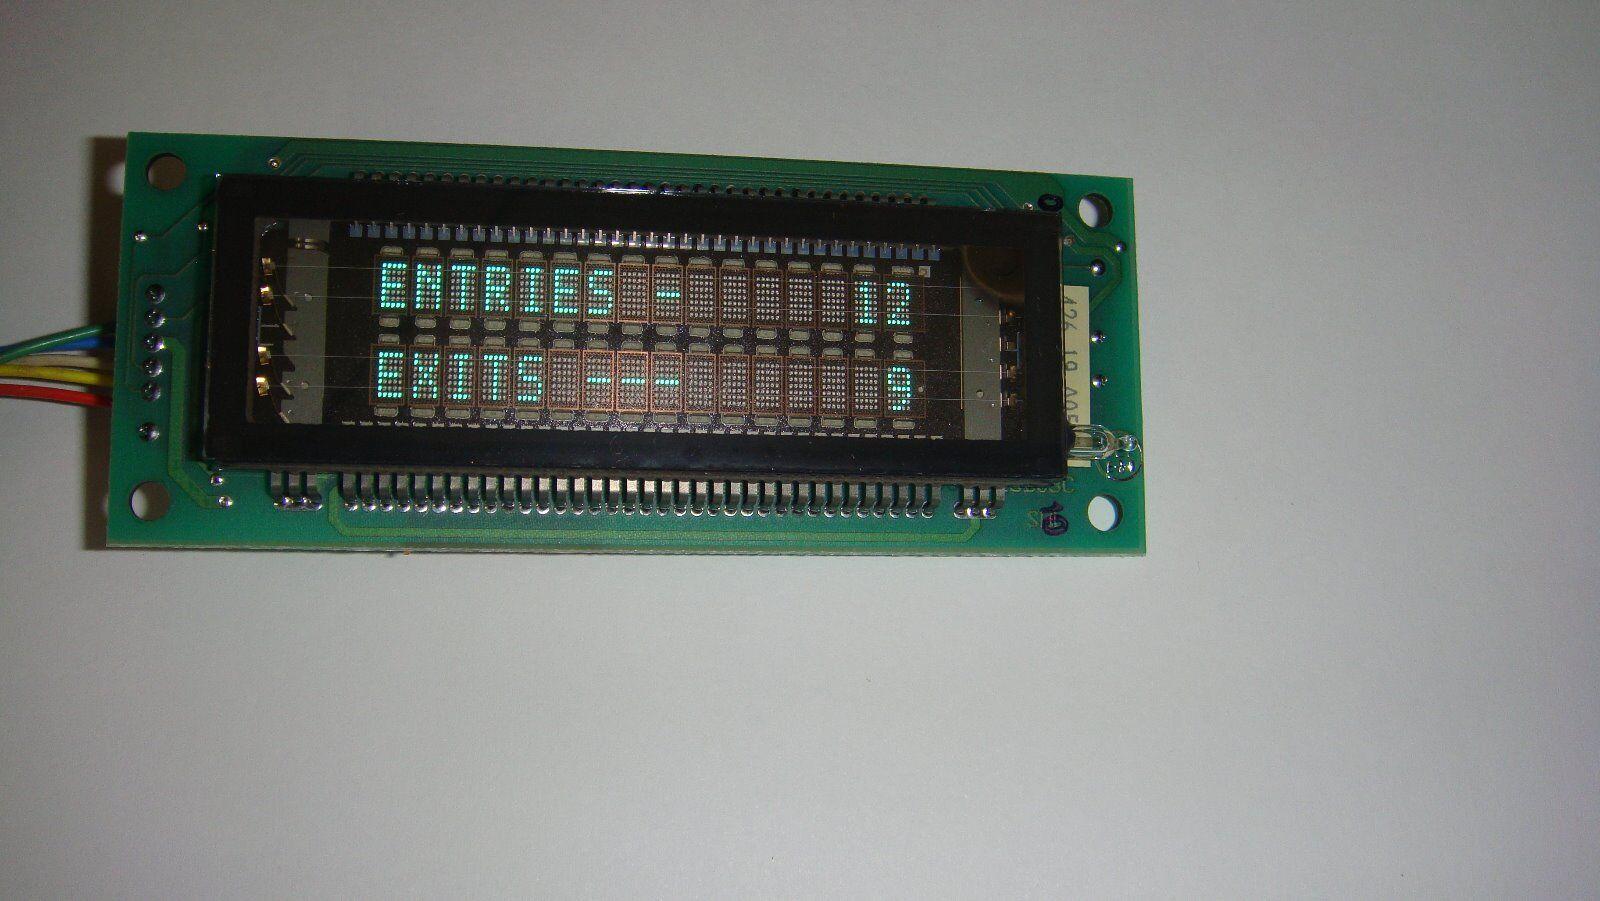 Us 162 Sd 03 Cb Futaba 2 X 16 Vaccume Fluorescent Display Ebay Lcd 2x16 16x2 1602 Module Arduino Raspberry Norton Secured Powered By Verisign